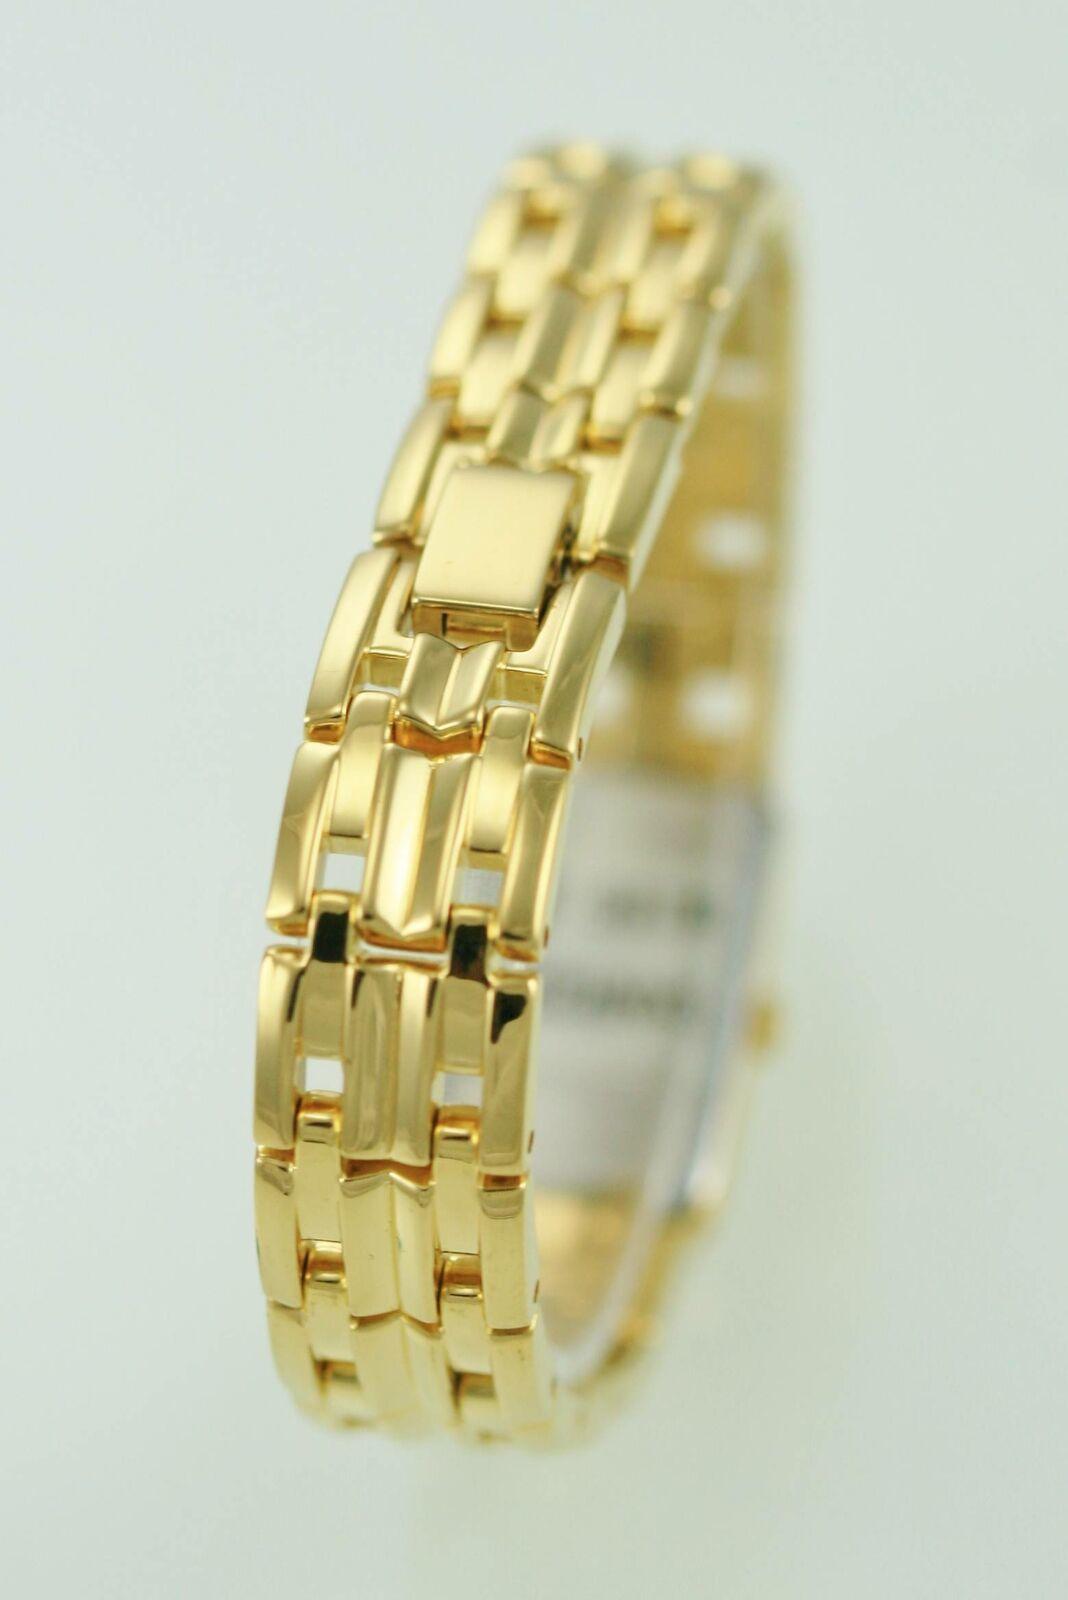 Seiko Womens Watch SXNR22 Gold Stainless Steel Water Resistant Beige Quartz